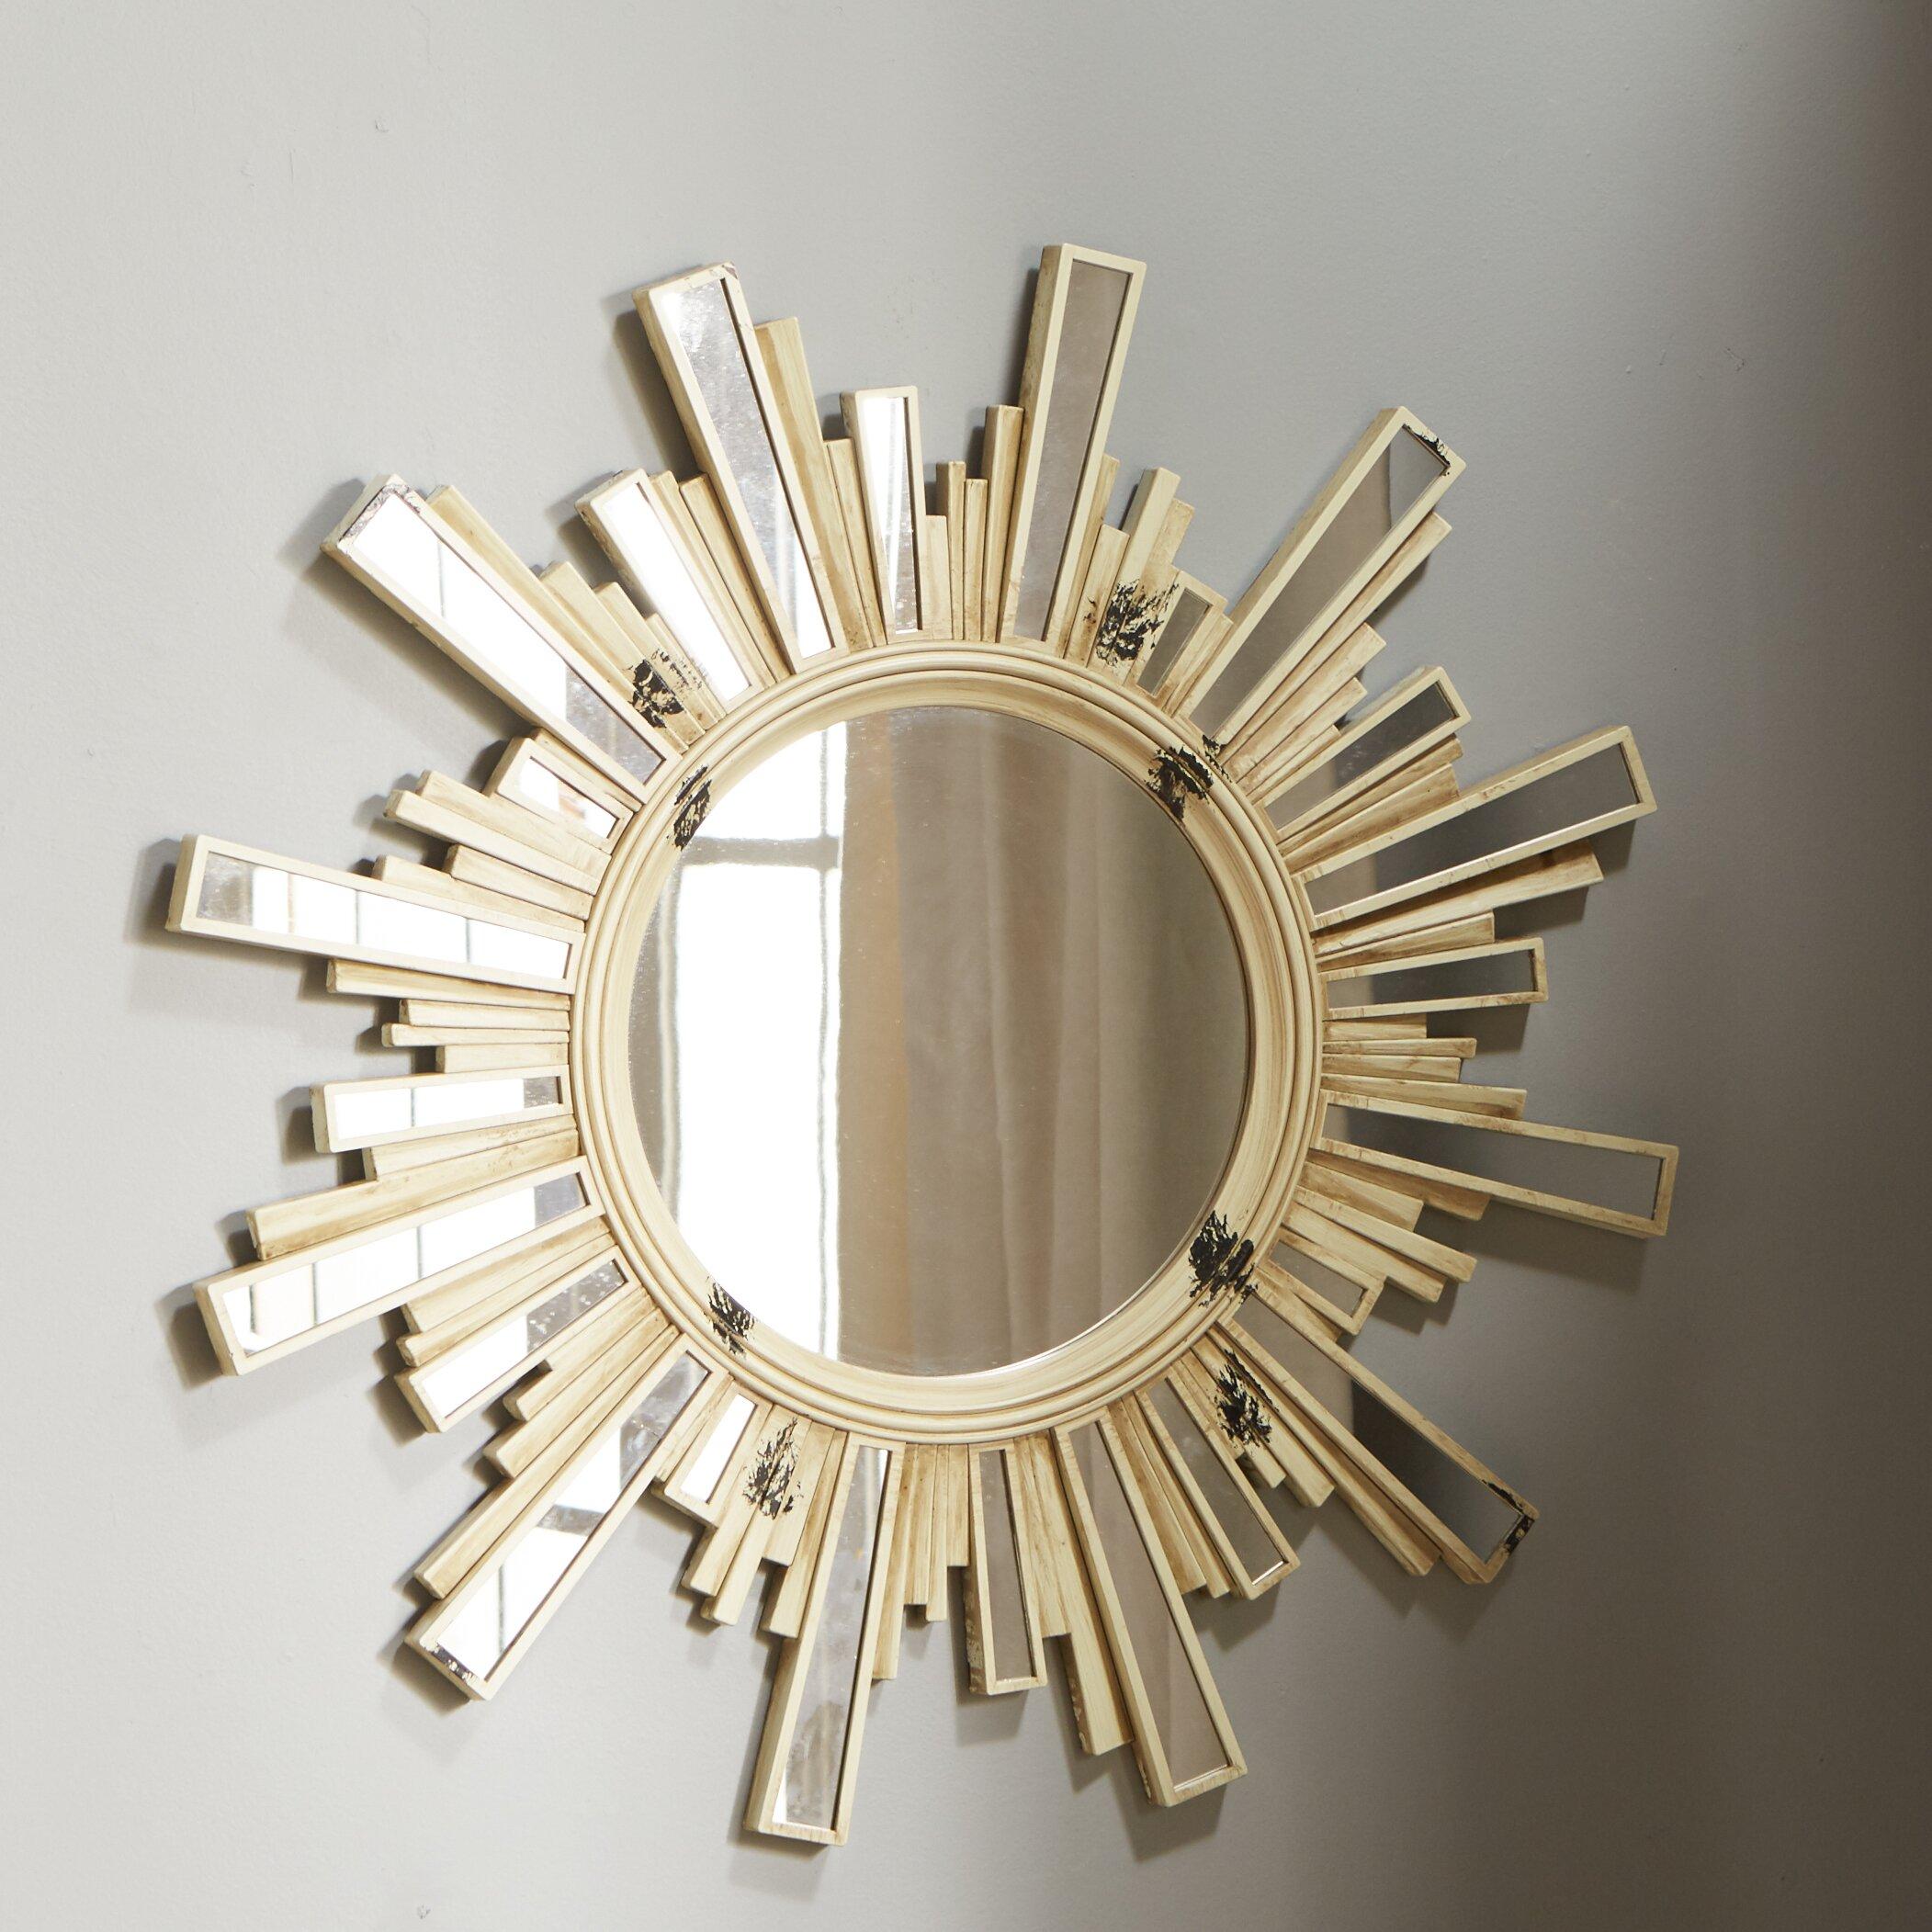 Koleimports paint splattered sunburst mirror with inlaid for Sunburst mirror